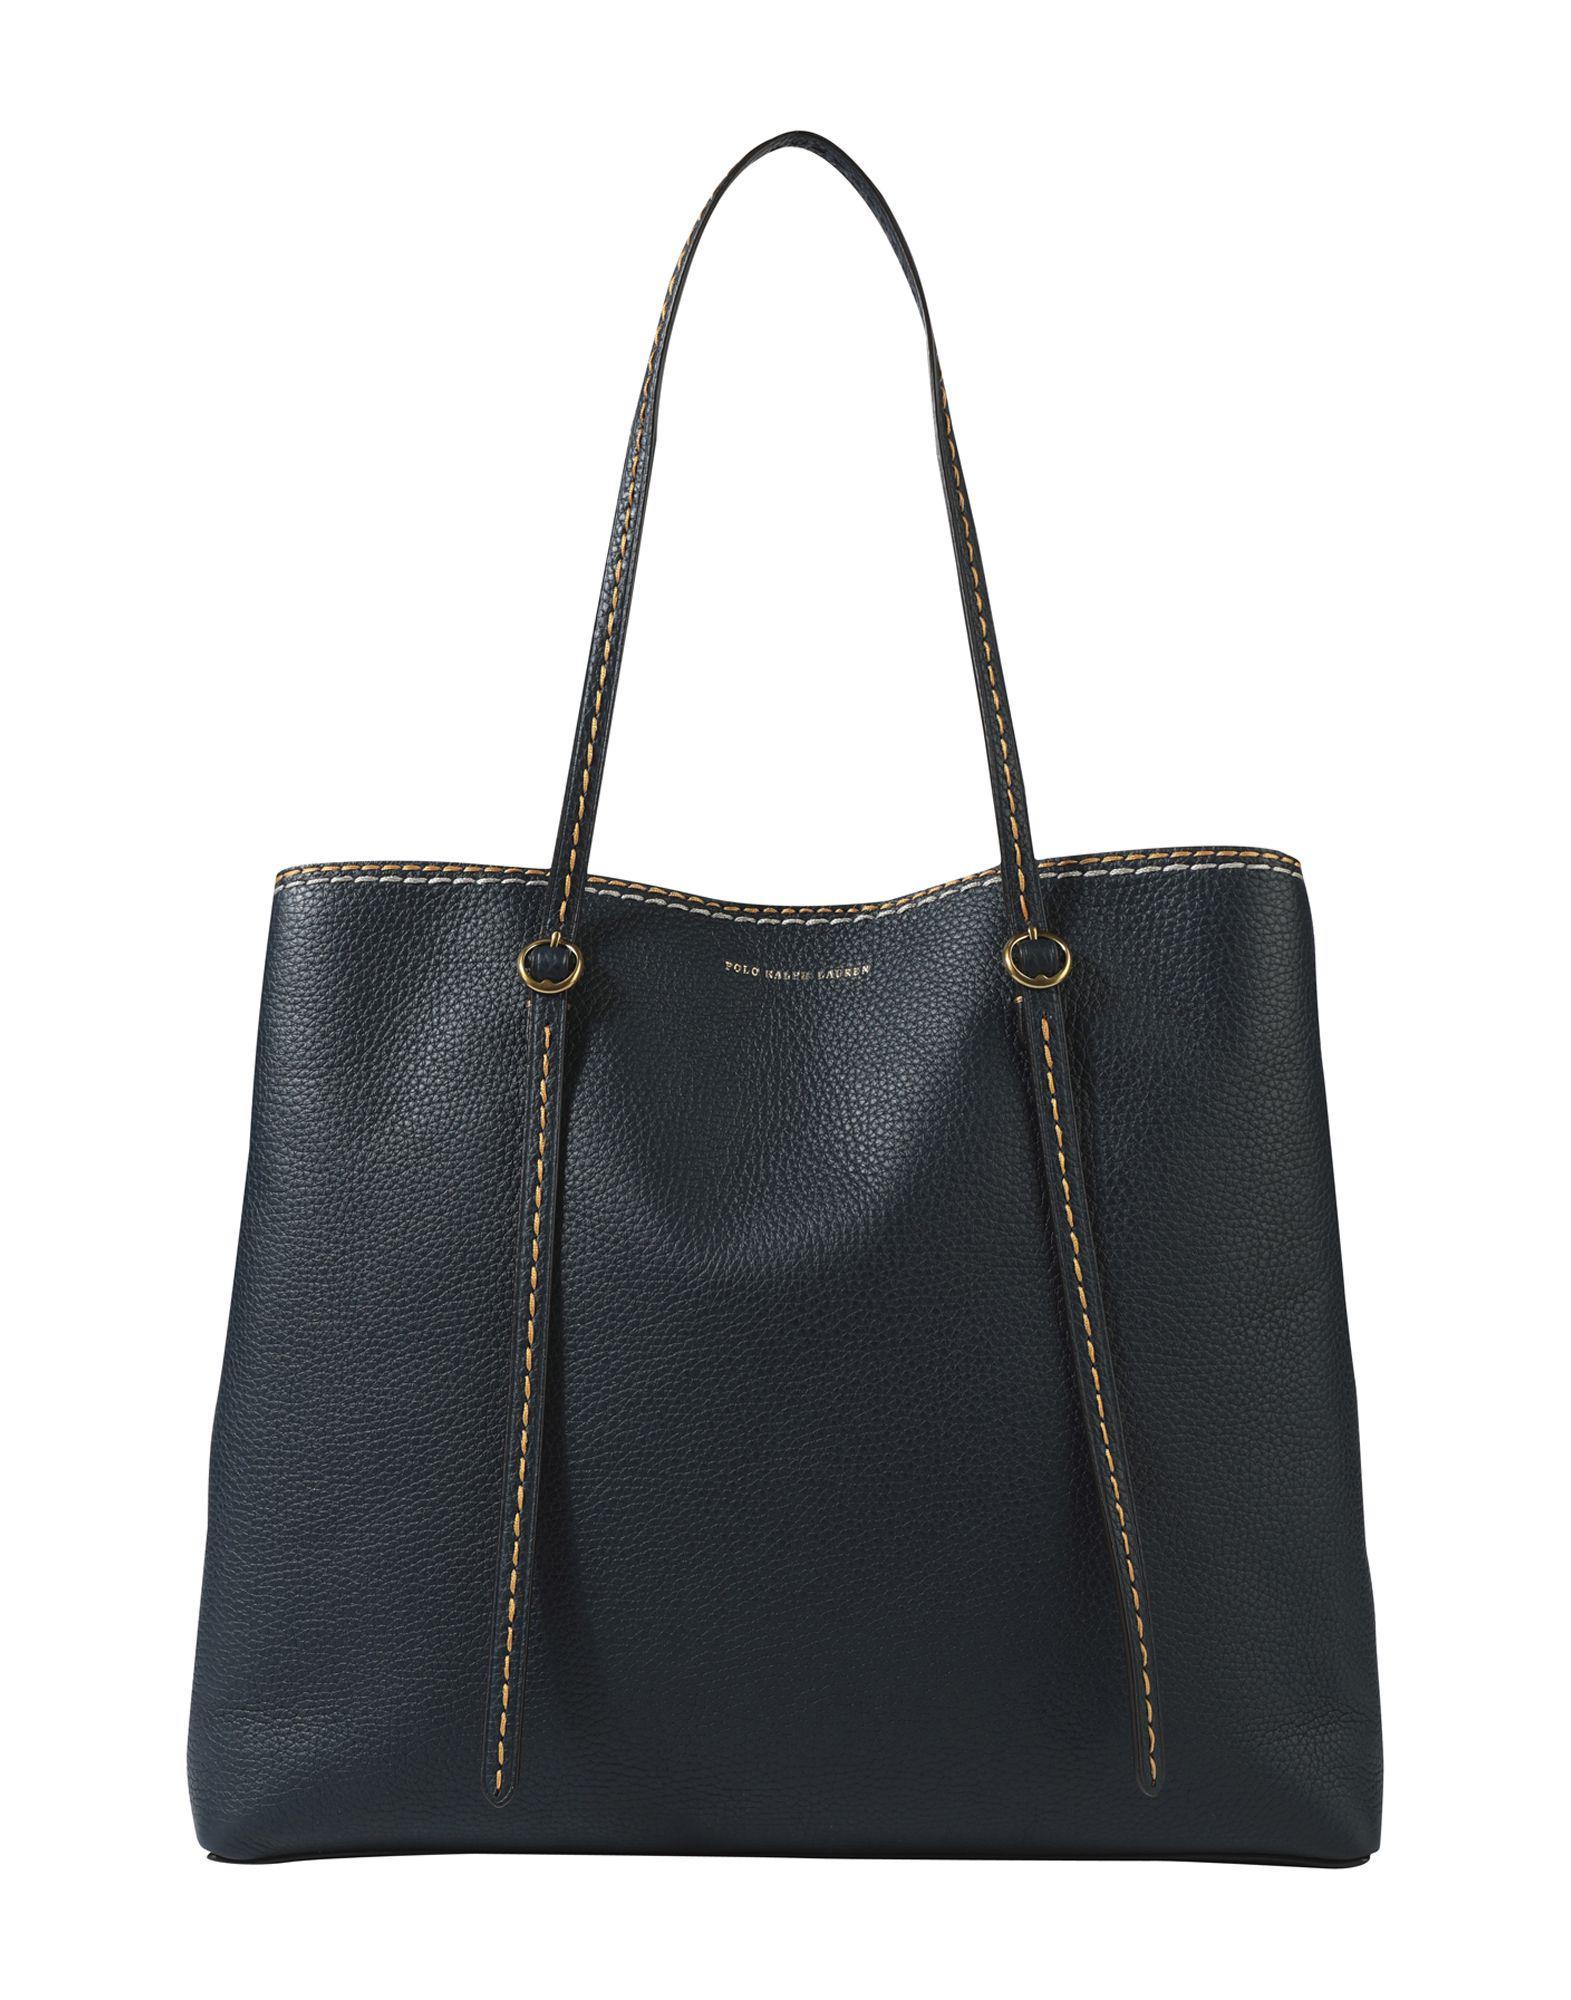 3165af30b1 Polo Ralph Lauren Handbag in Blue - Lyst